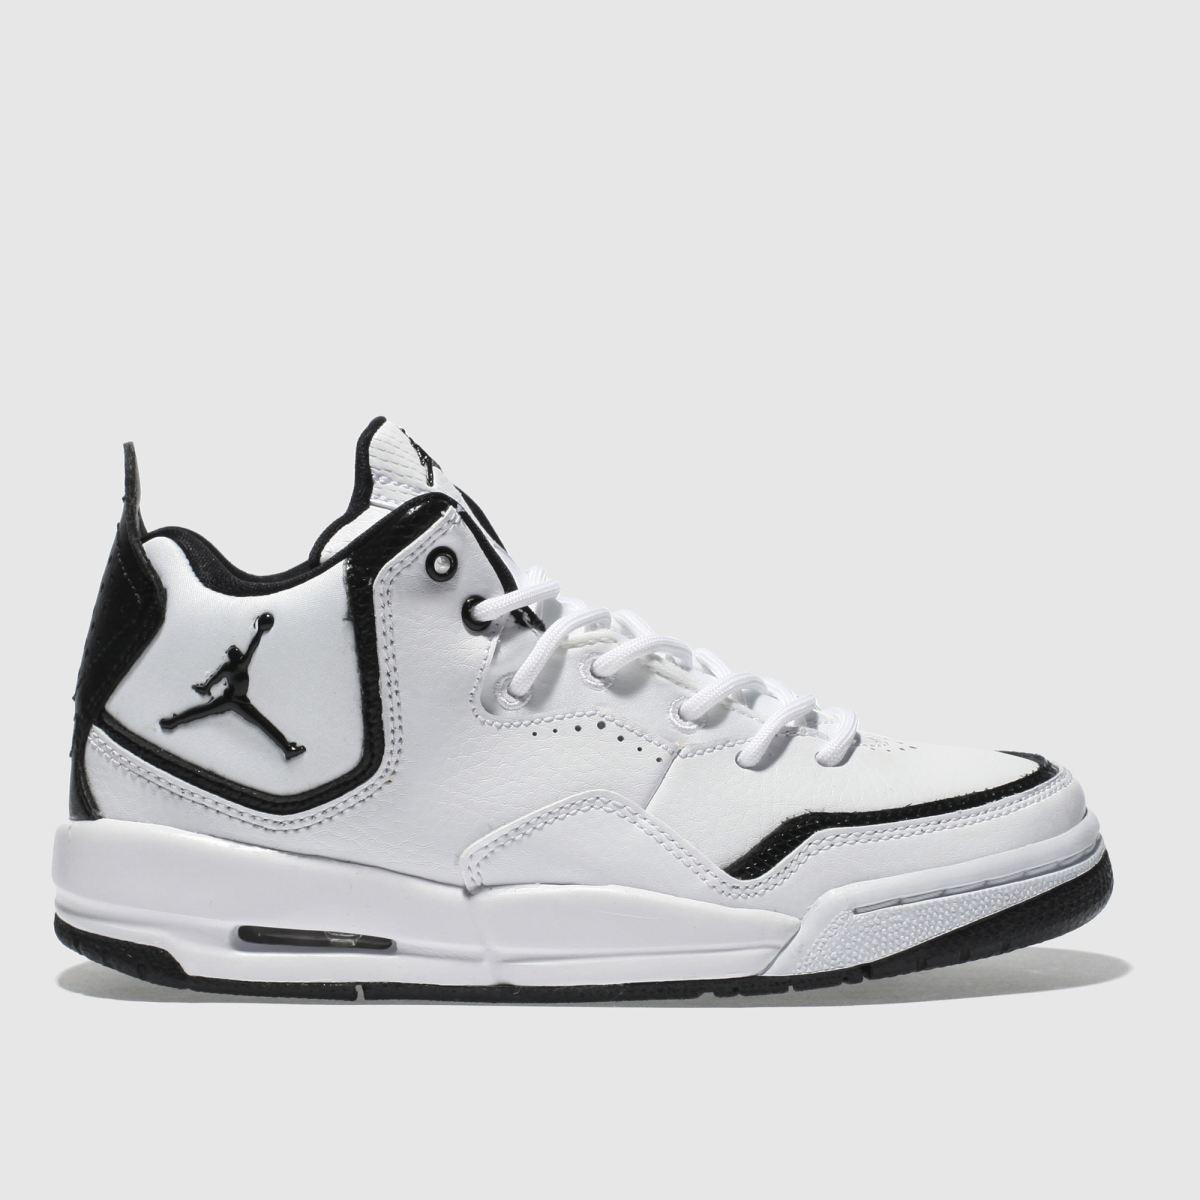 Nike Jordan White & Black Courtside 23 Youth Trainers